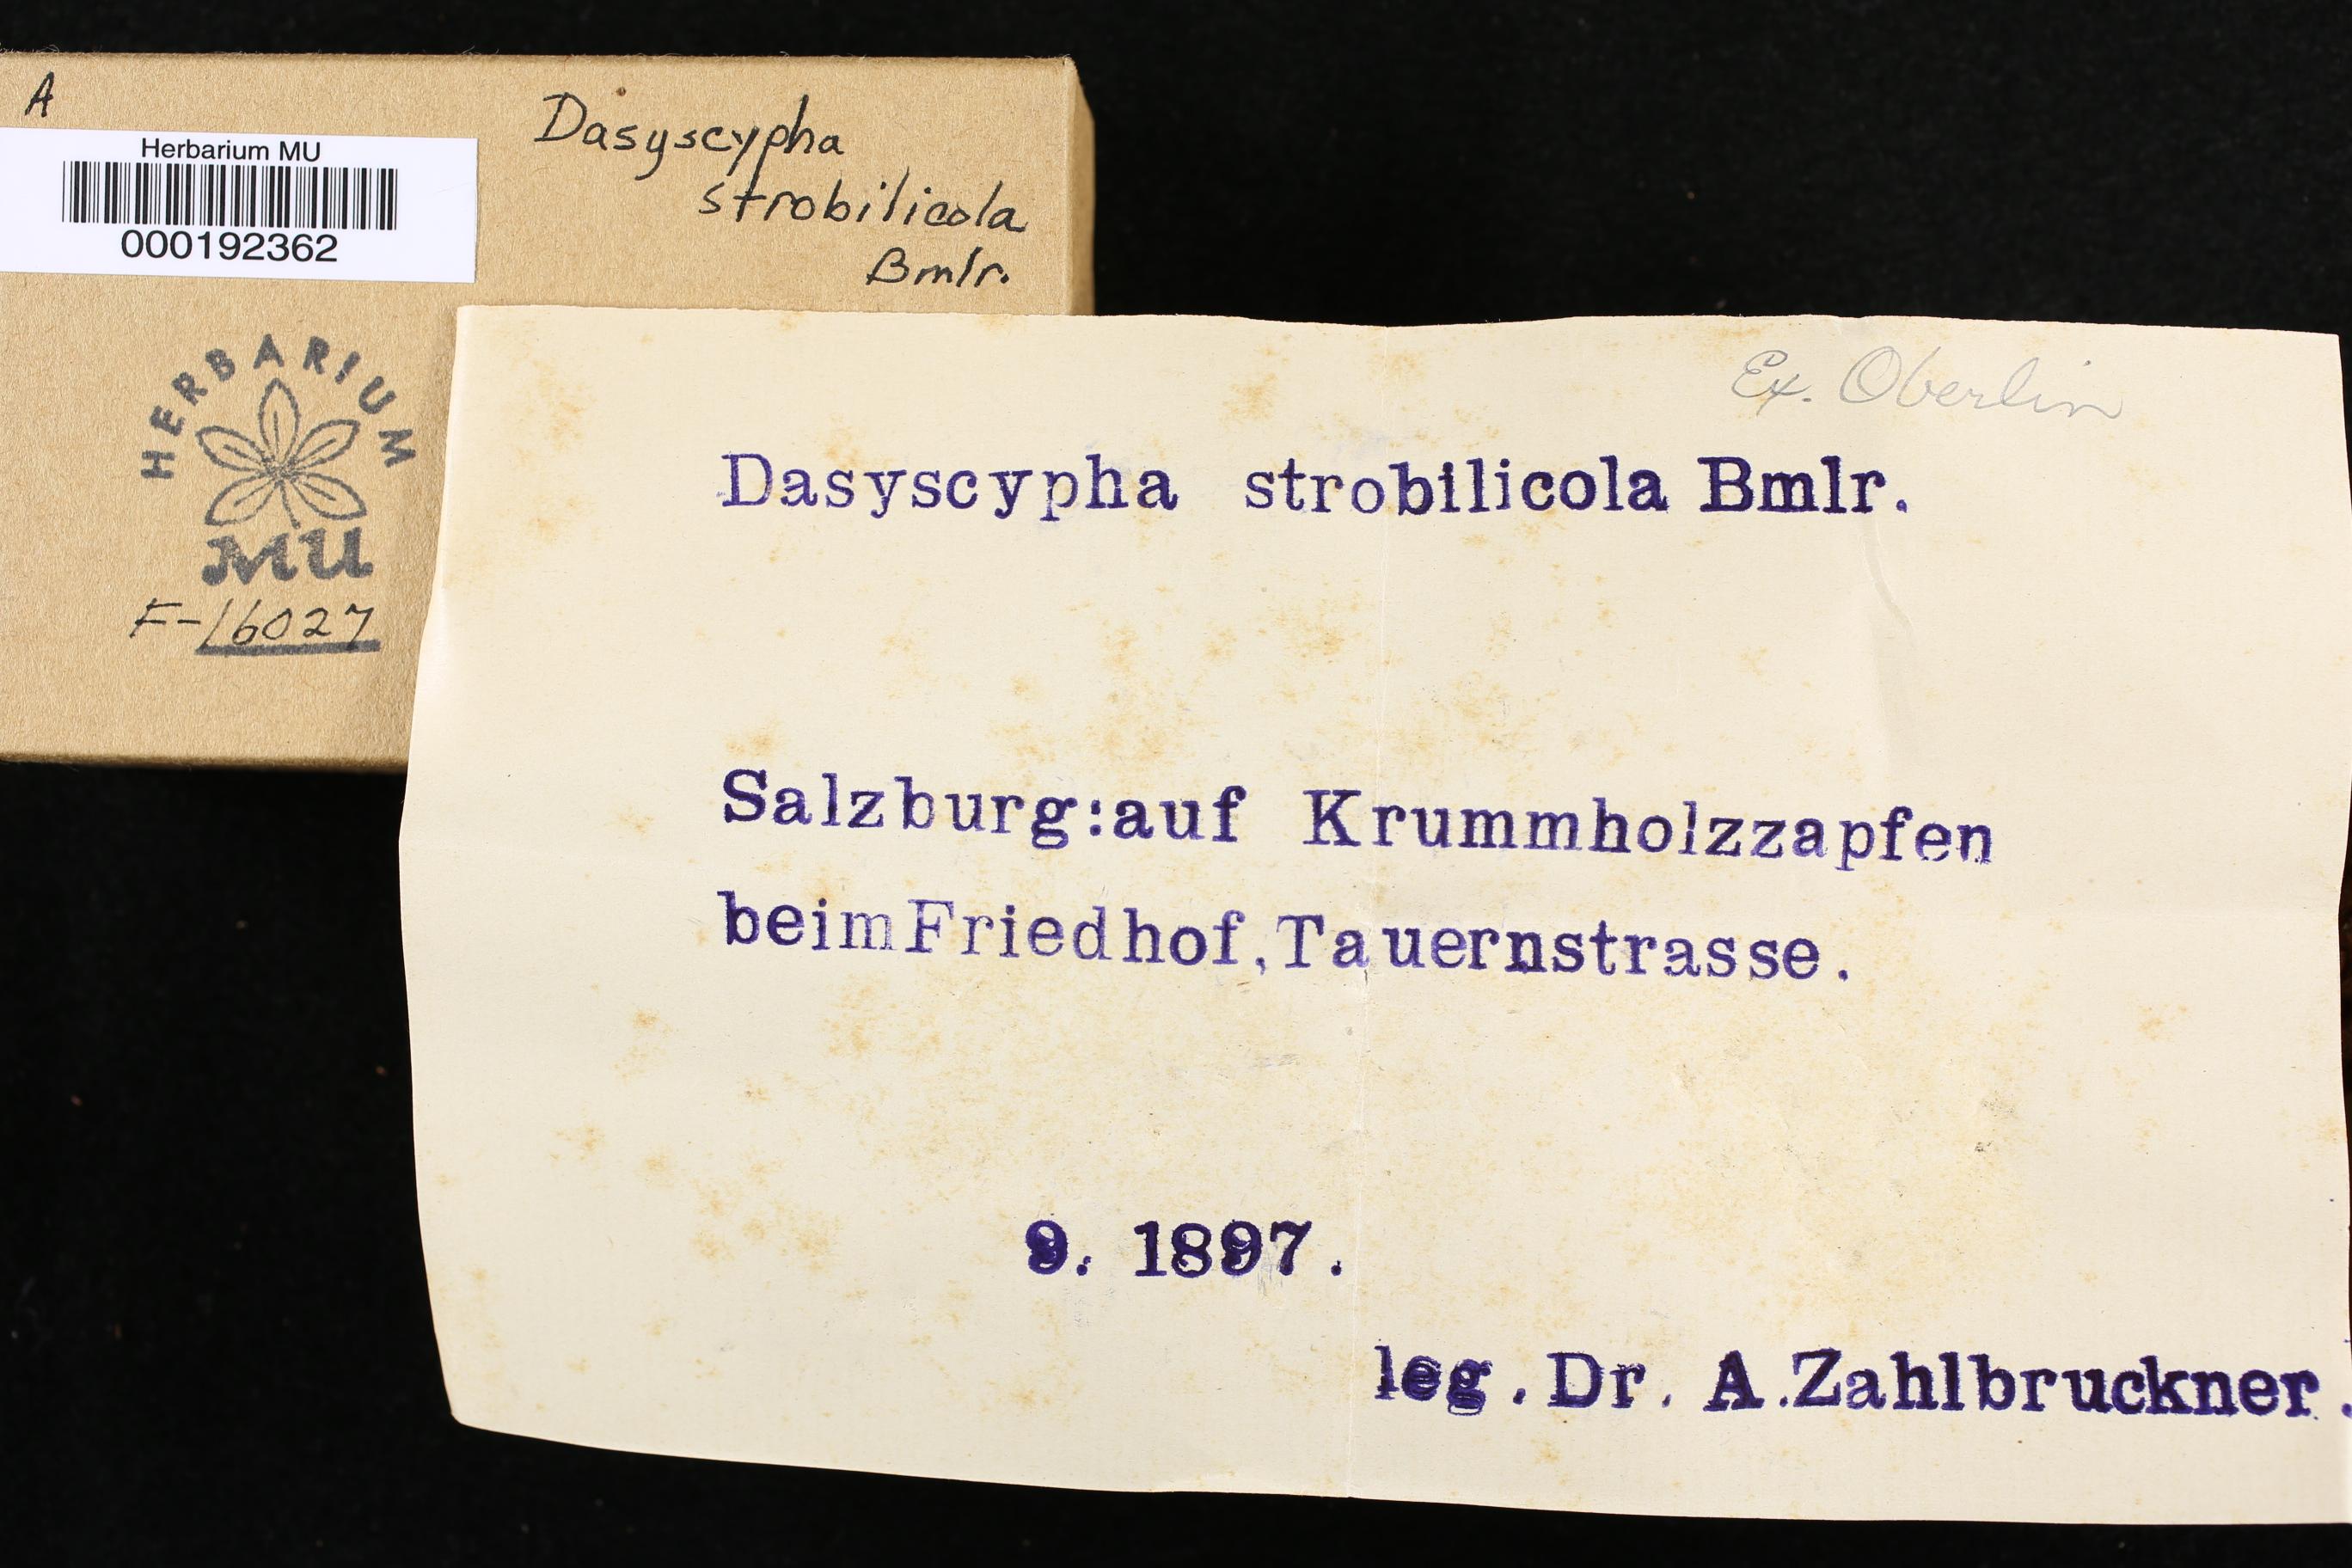 Dasyscypha strobilicolus image